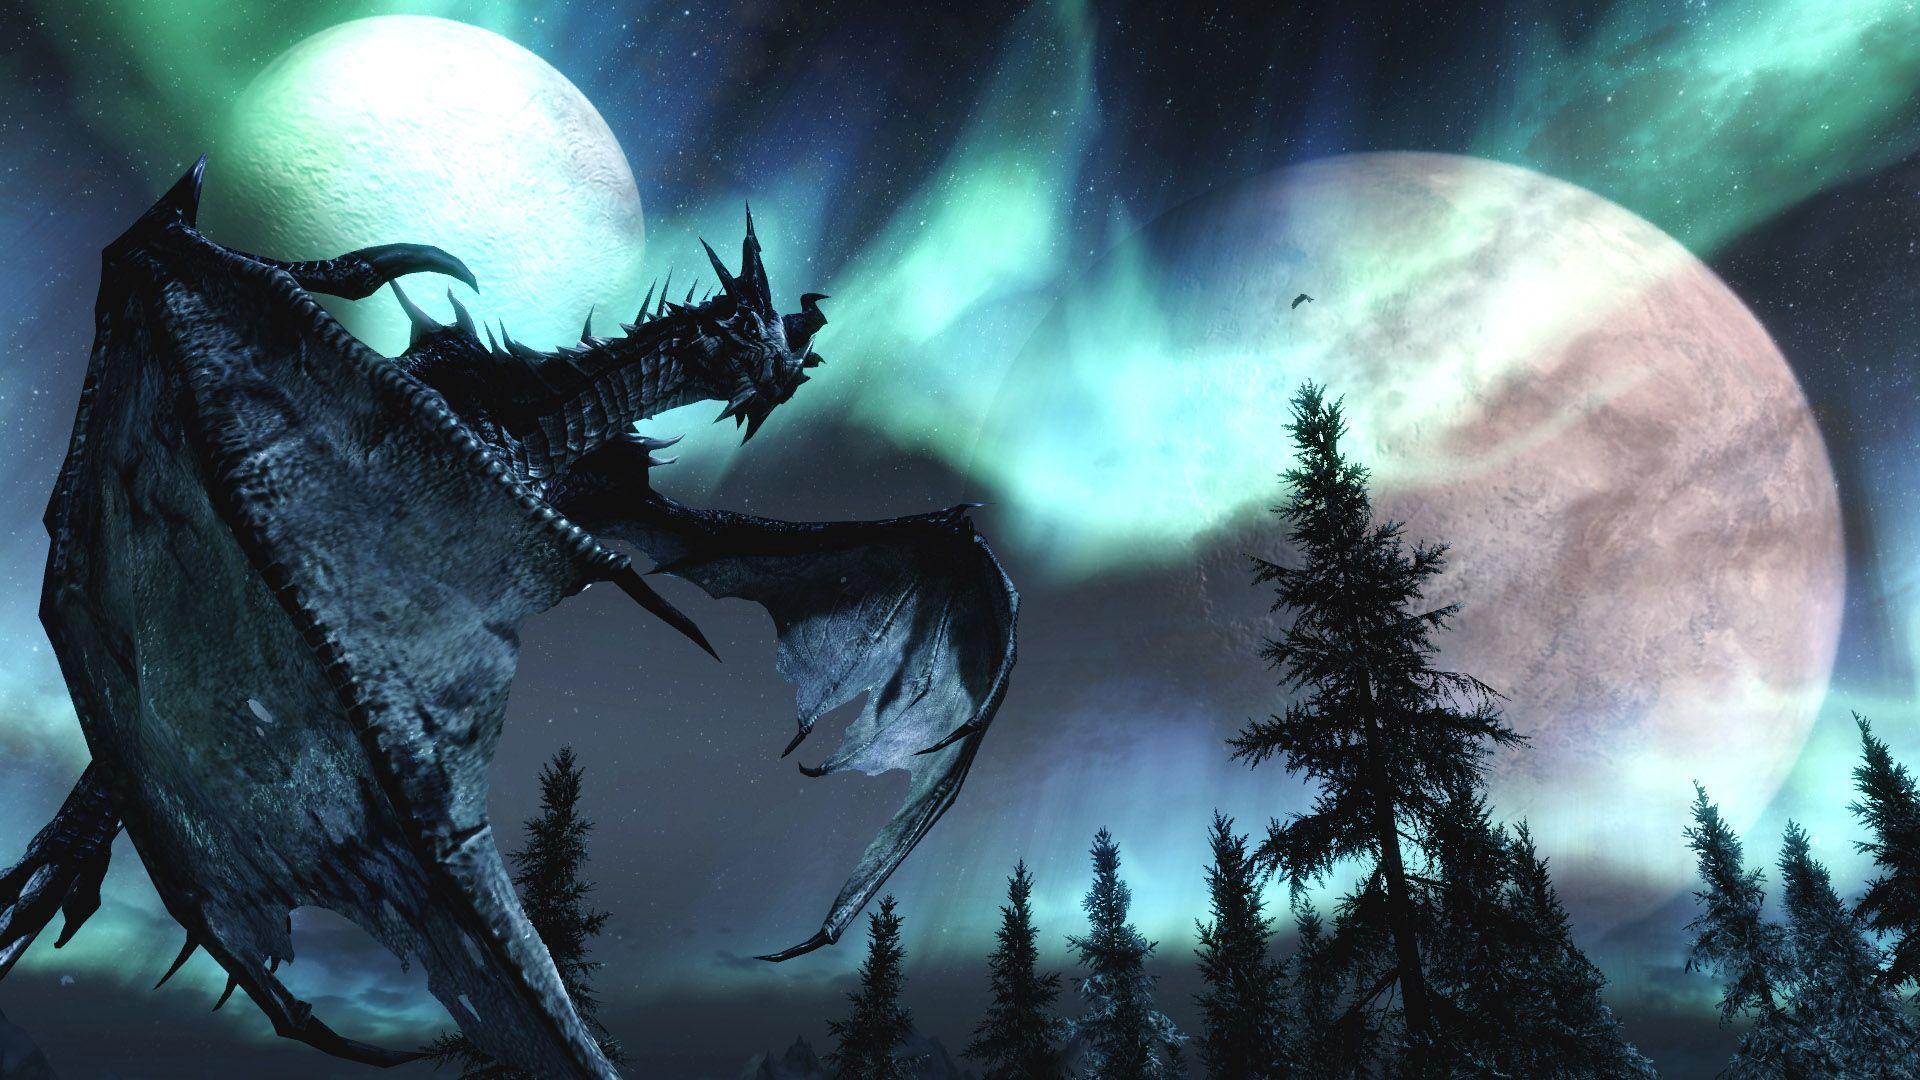 Skyrim Dragon Wallpapers For Desktop Background Wallpaper Hd